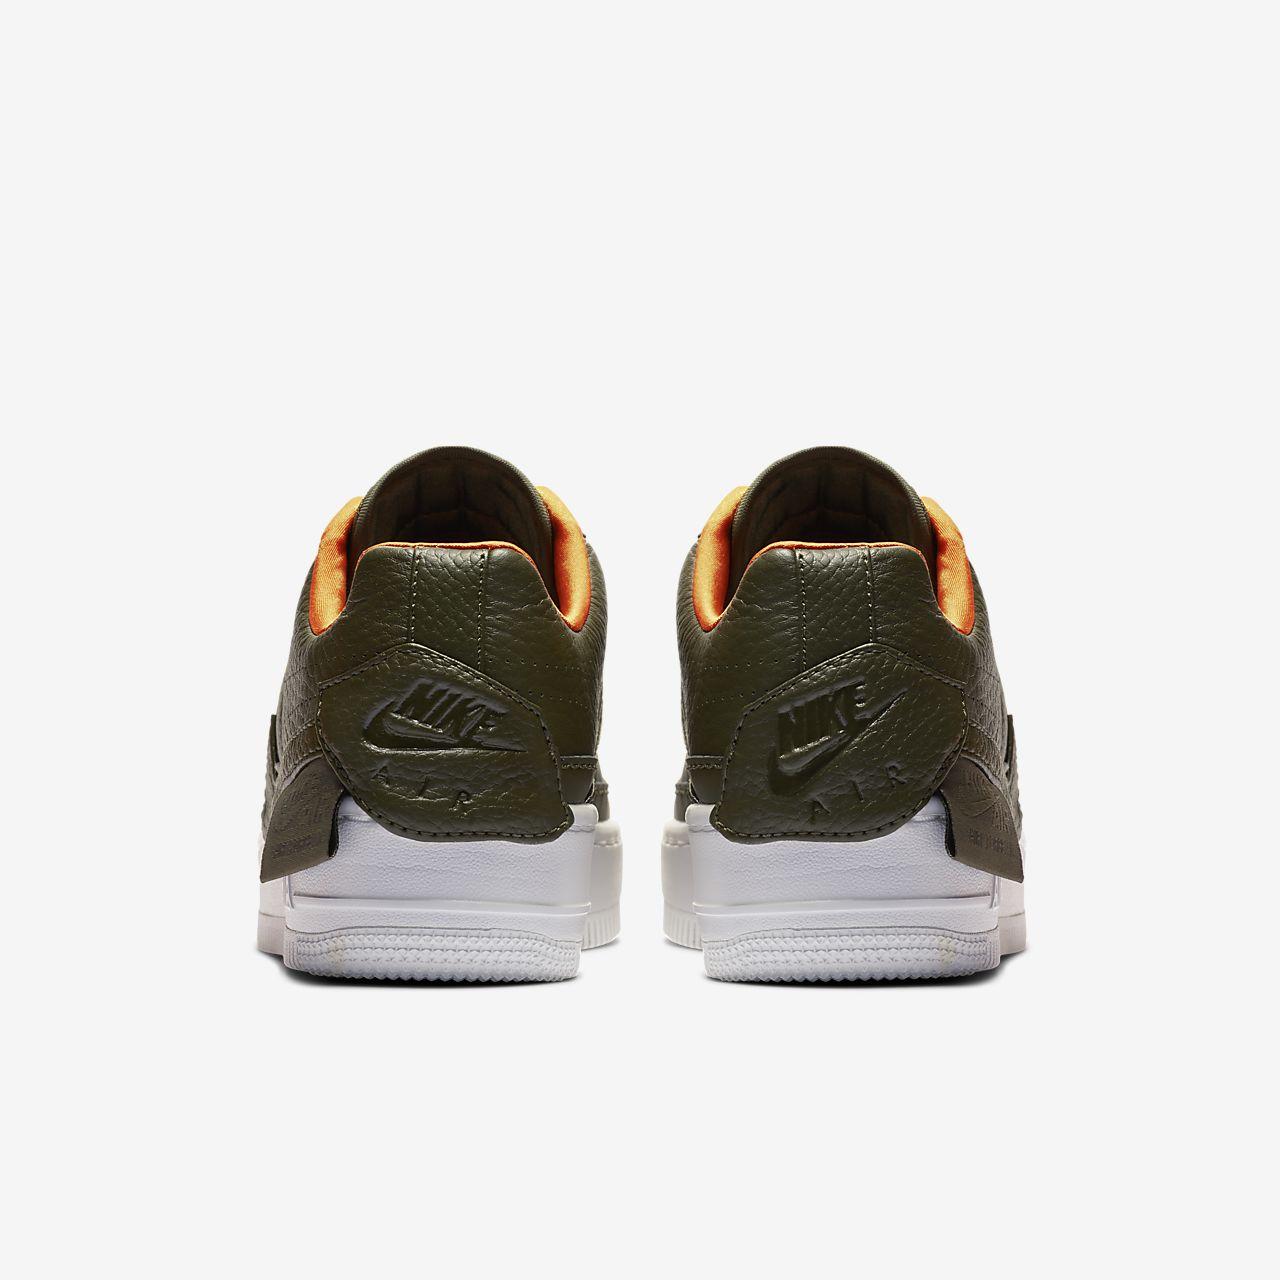 Nike Force Pour Xx Premium Air Be Chaussure 1 Femme Jester aqTndaEH